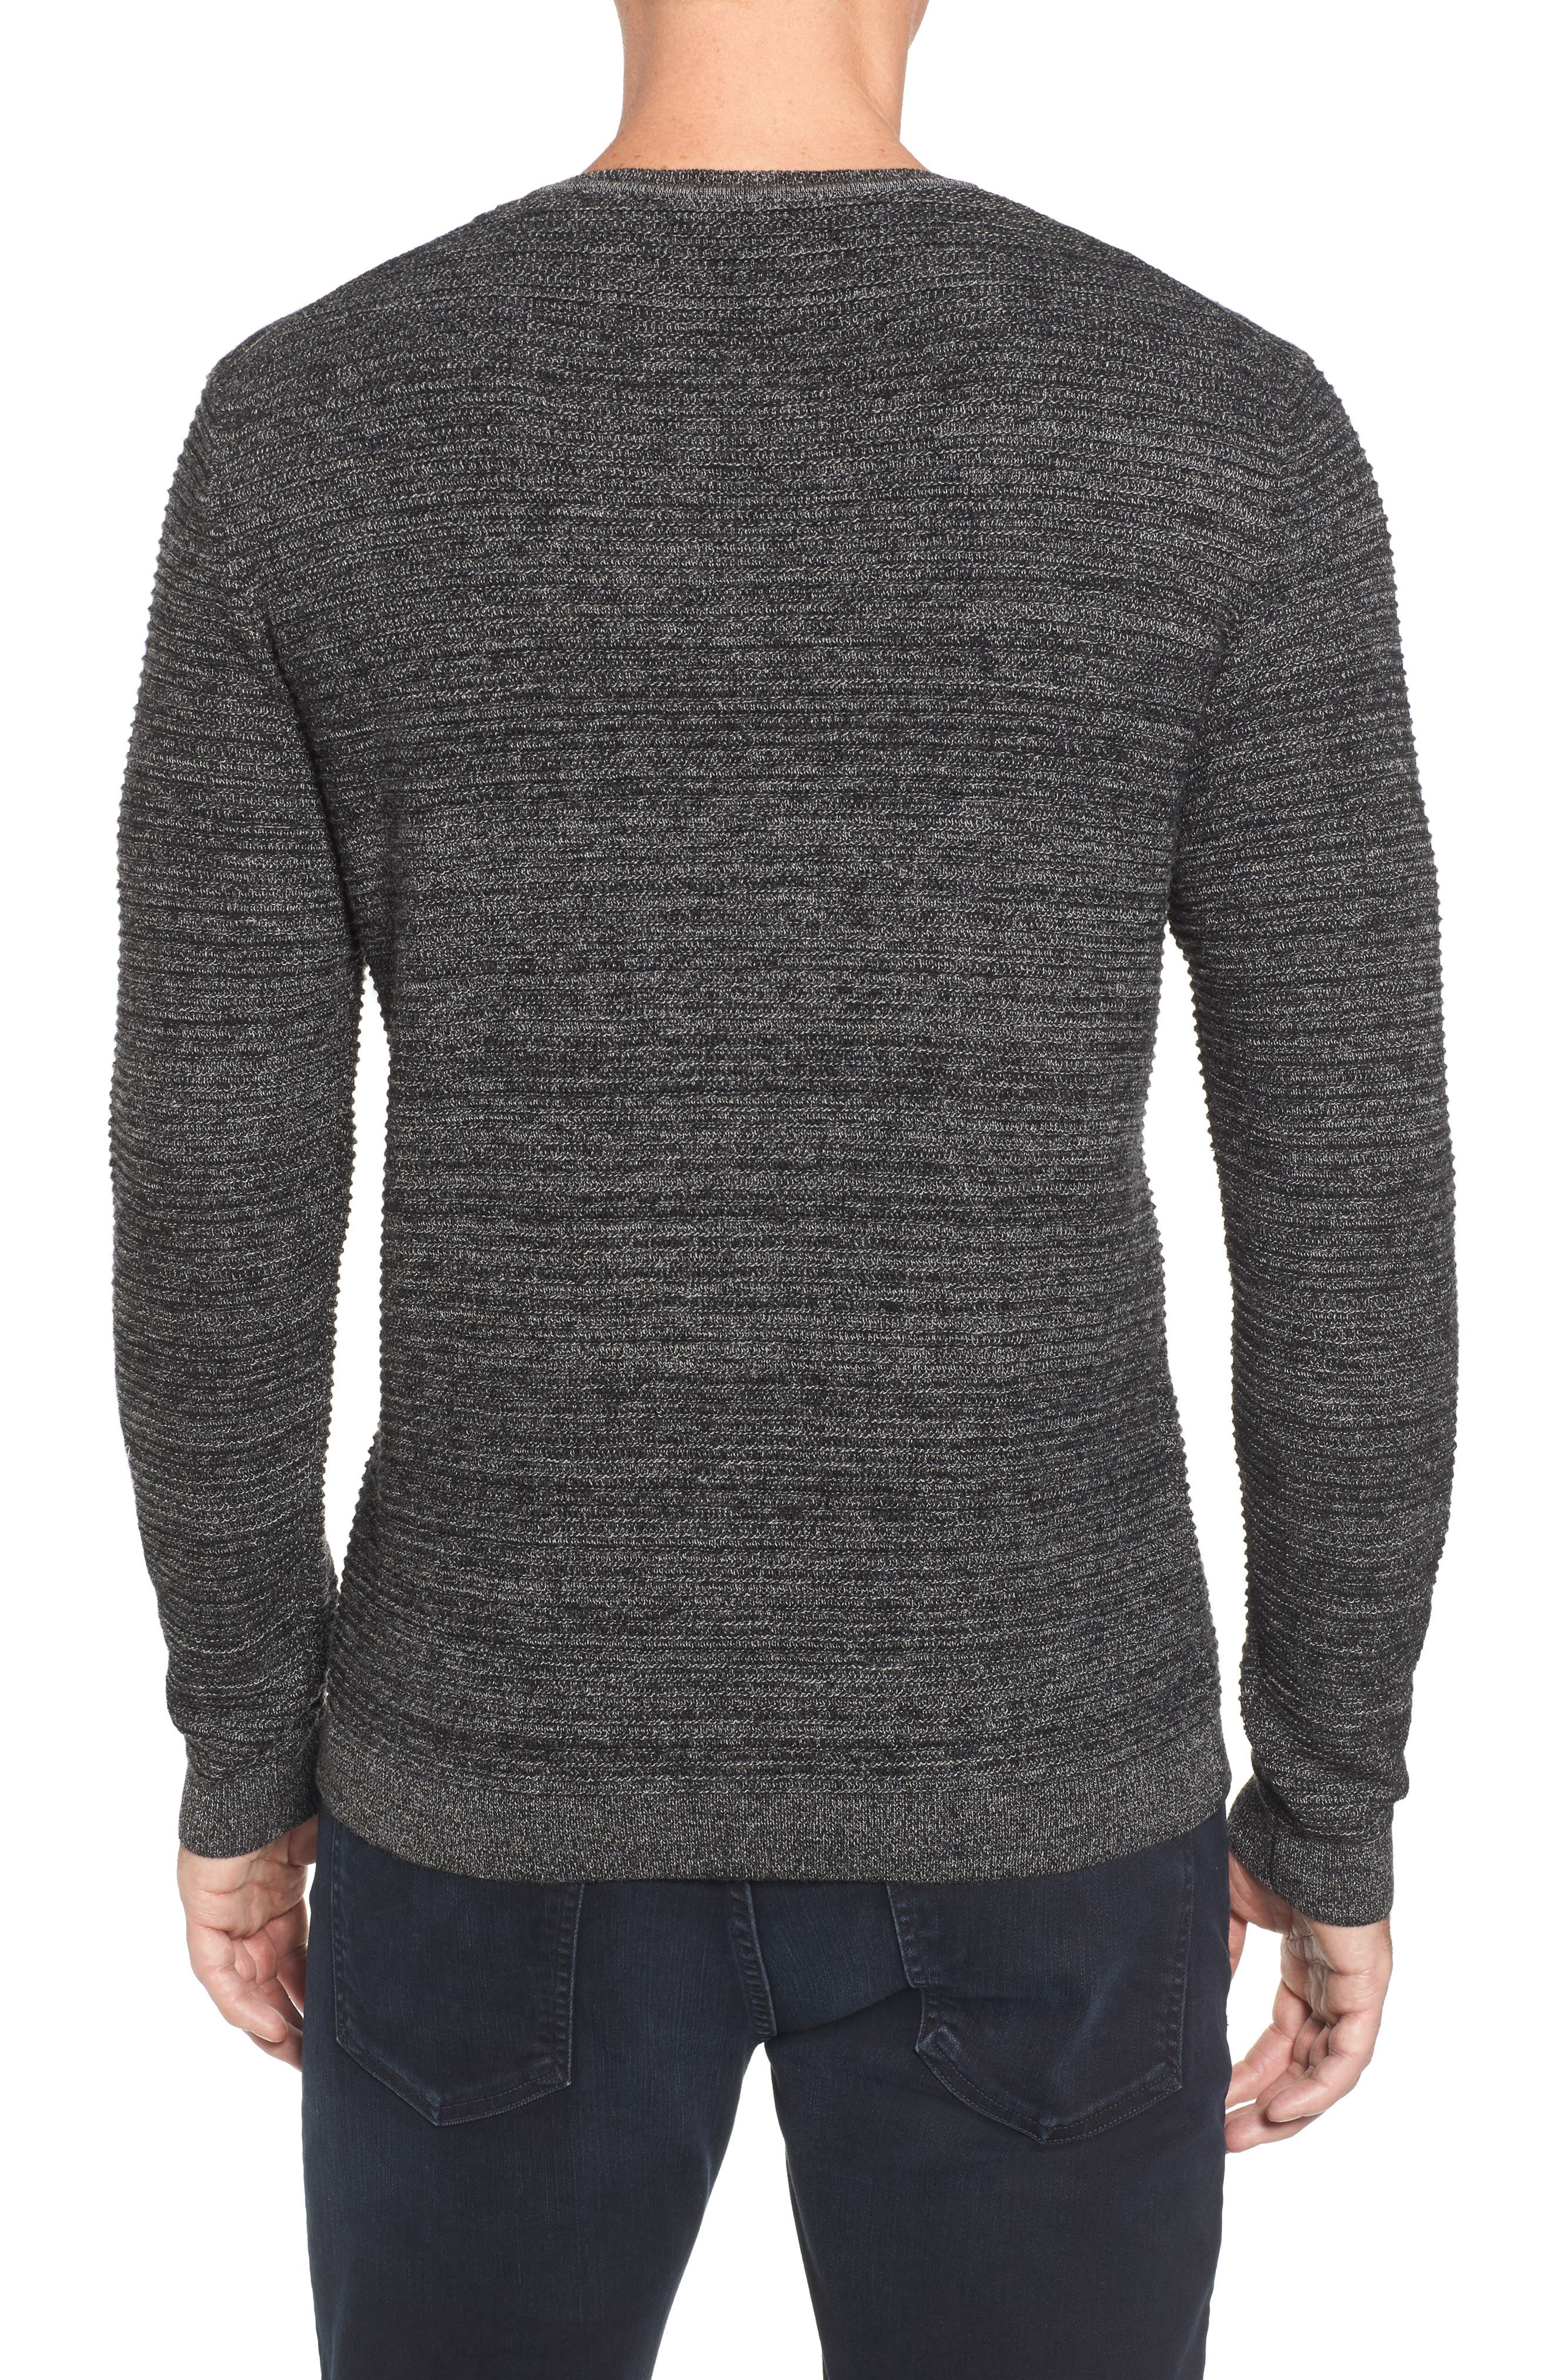 Ottoman Wool Blend Sweater,                             Alternate thumbnail 2, color,